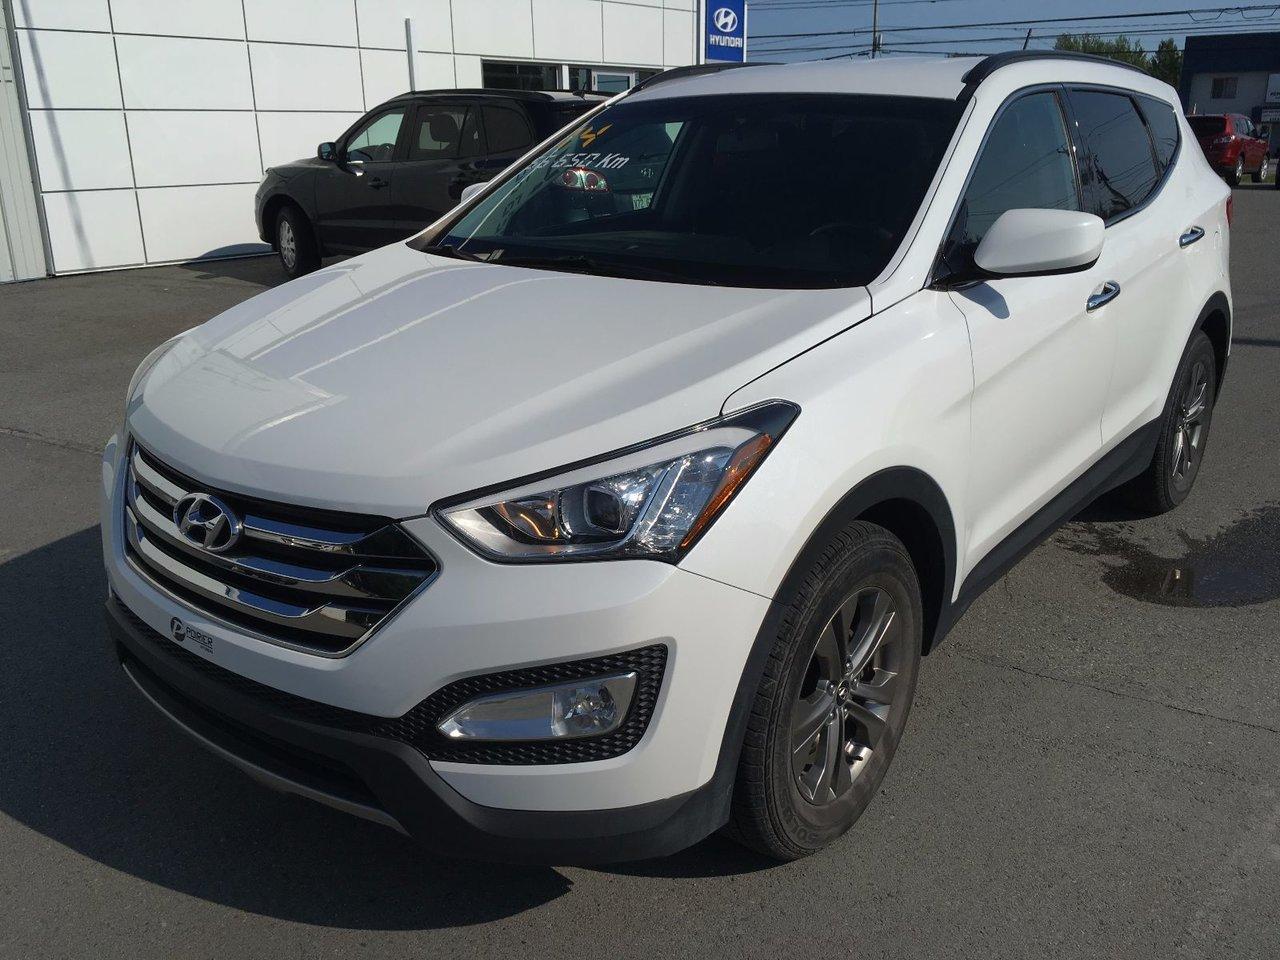 Hyundai Santa Fe Sport 2.4L AWD 2014